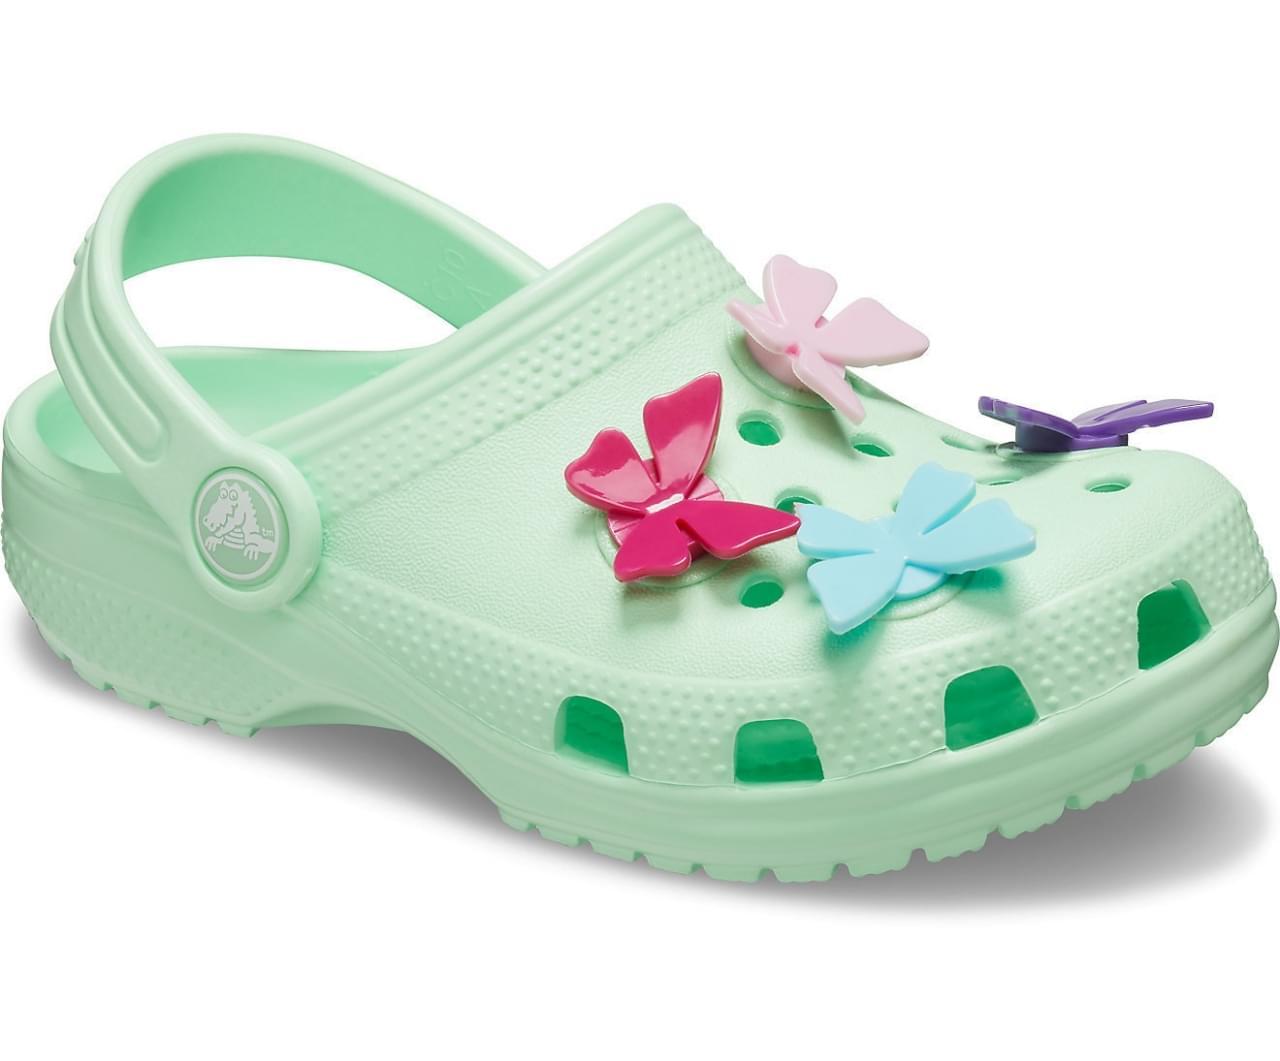 Crocs Classic Butterfly Charm Klomp Kids